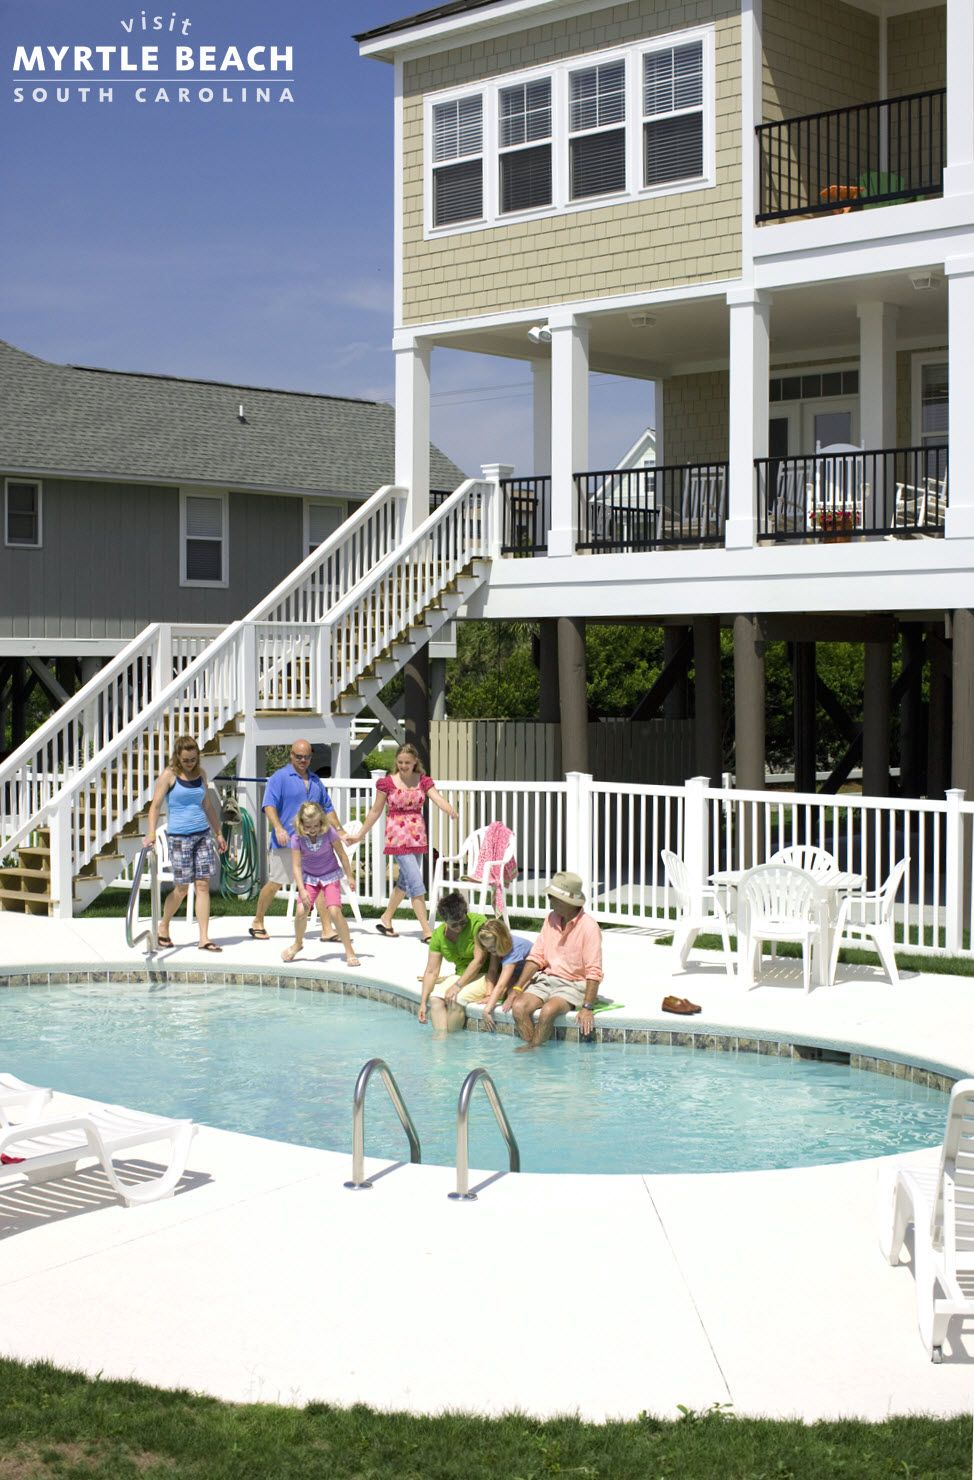 House Rentals South Carolina Myrtle Beach